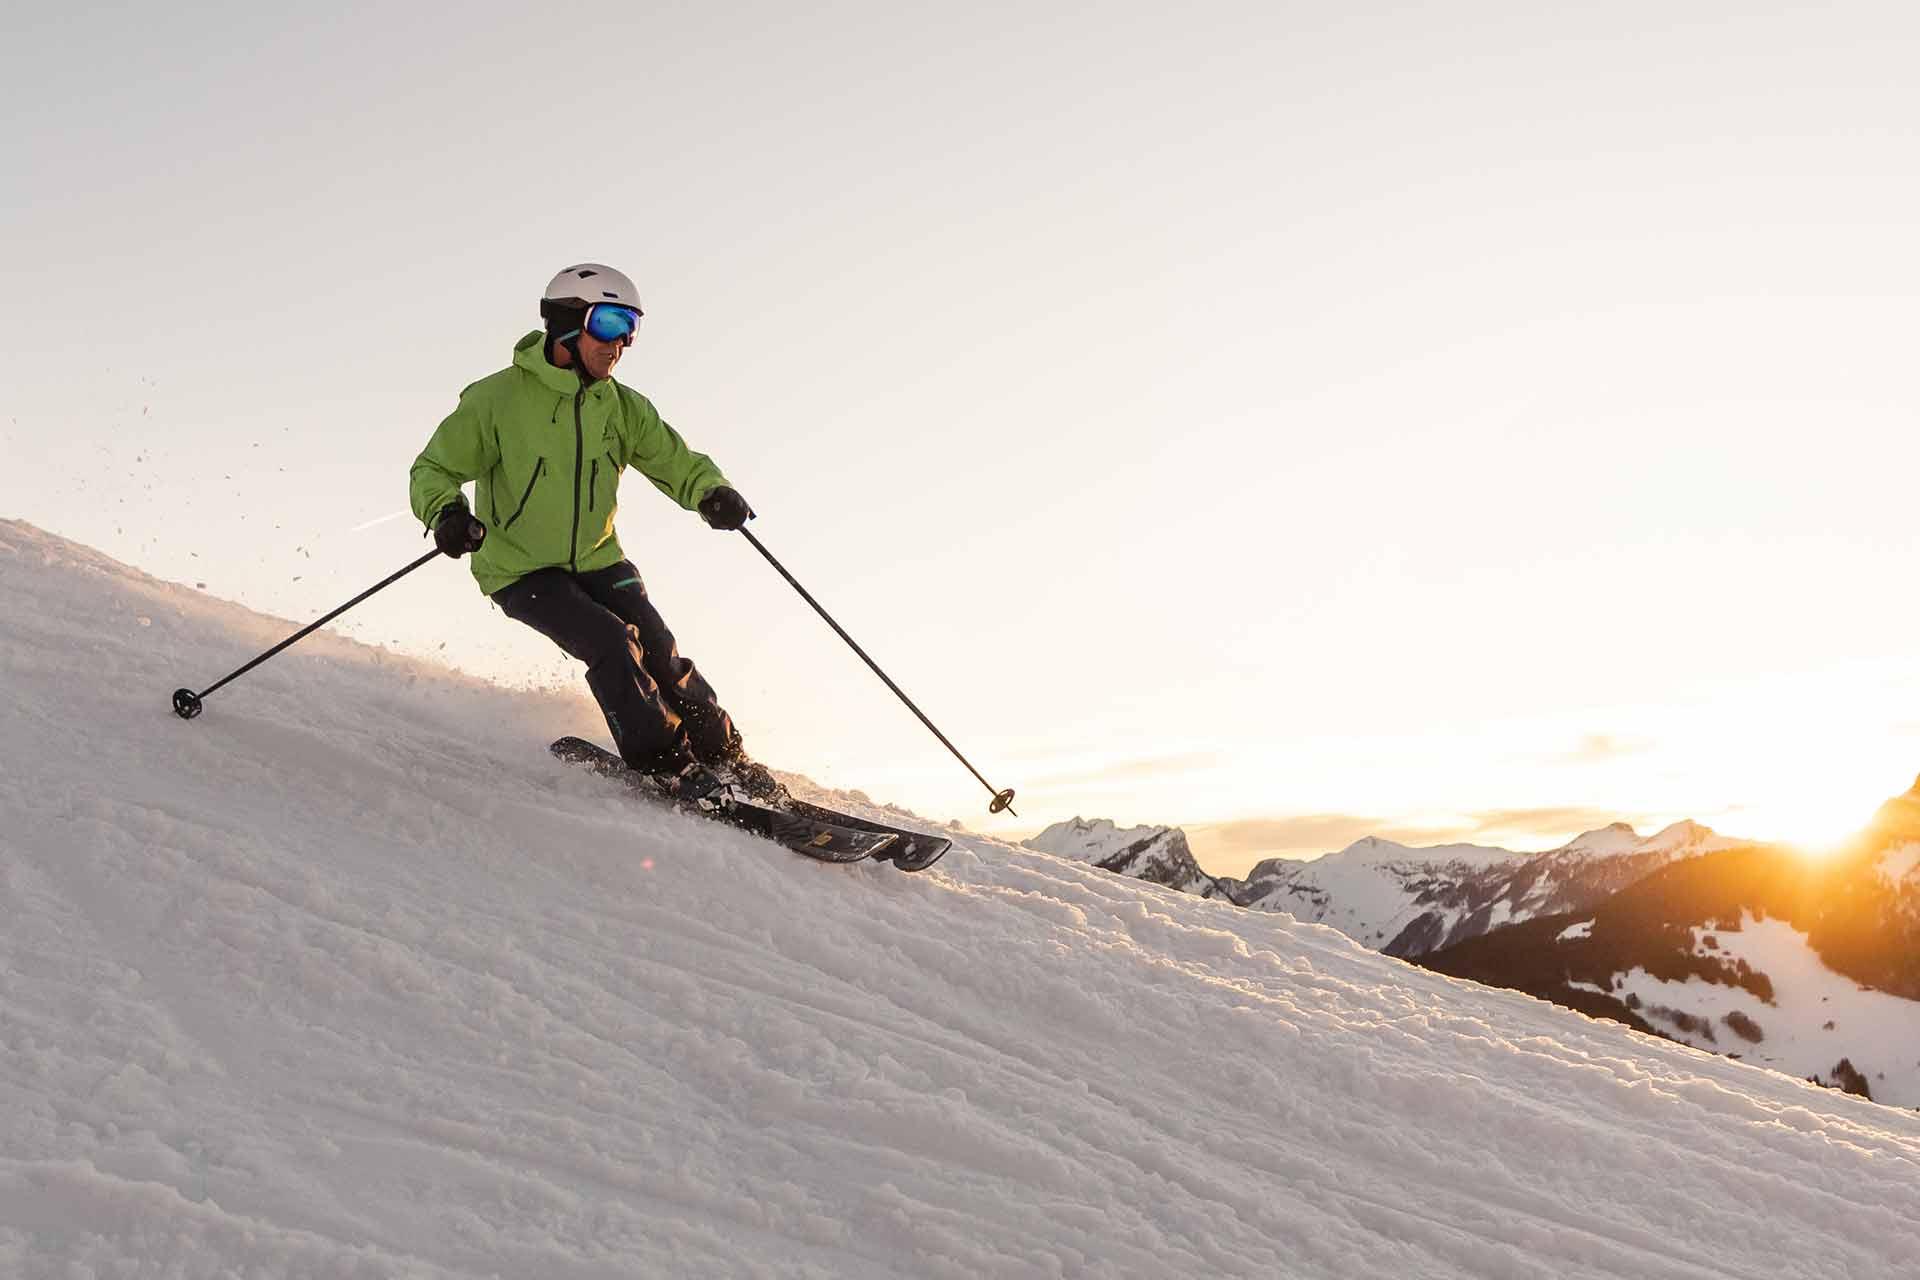 Manigod ski area - © Alpcat Medias